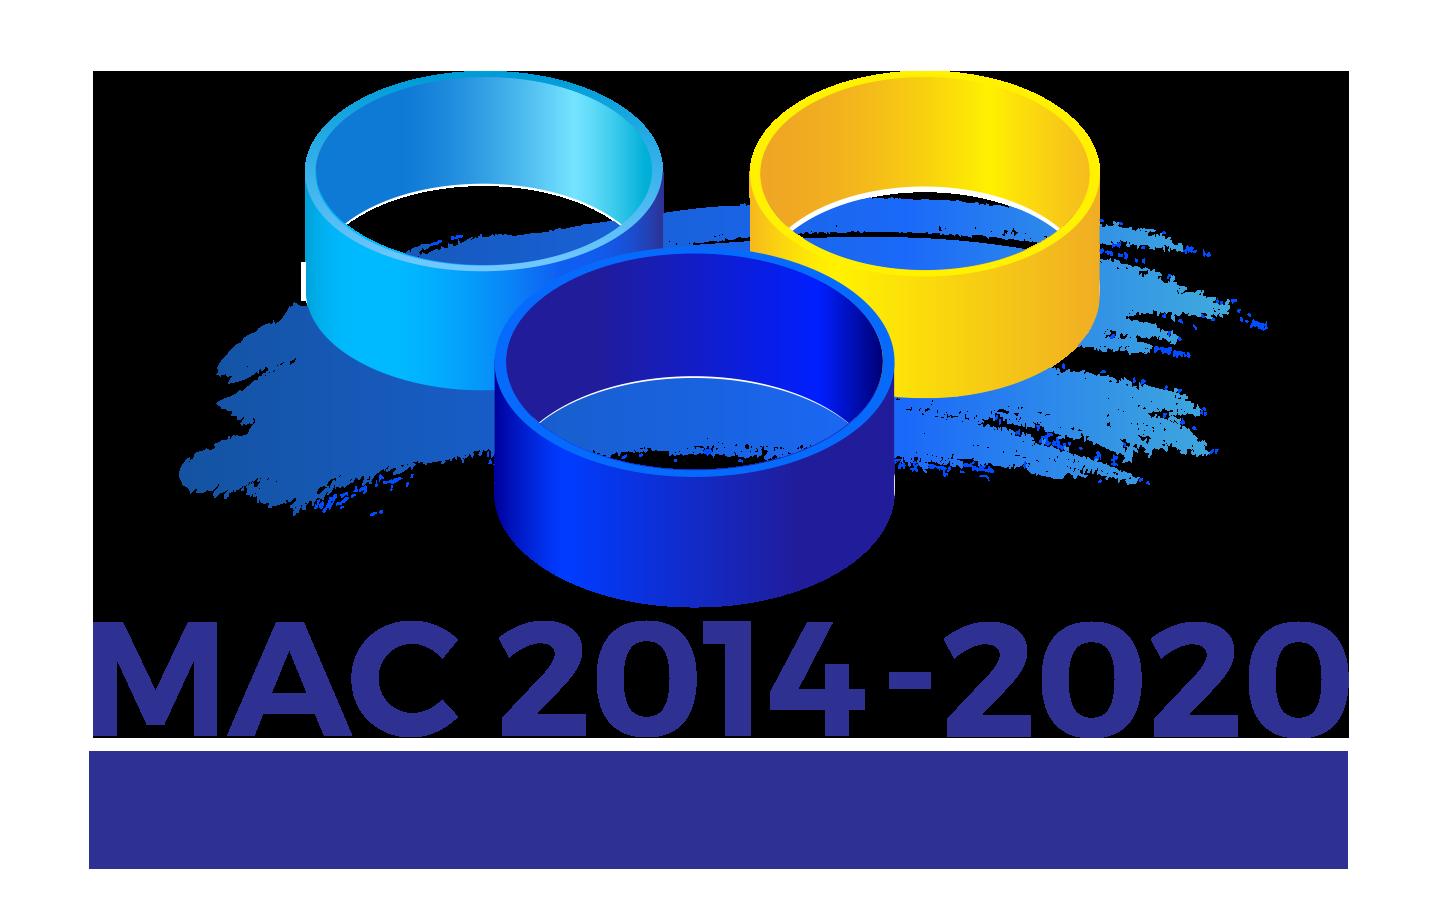 INTERREG MAC 2014-2020